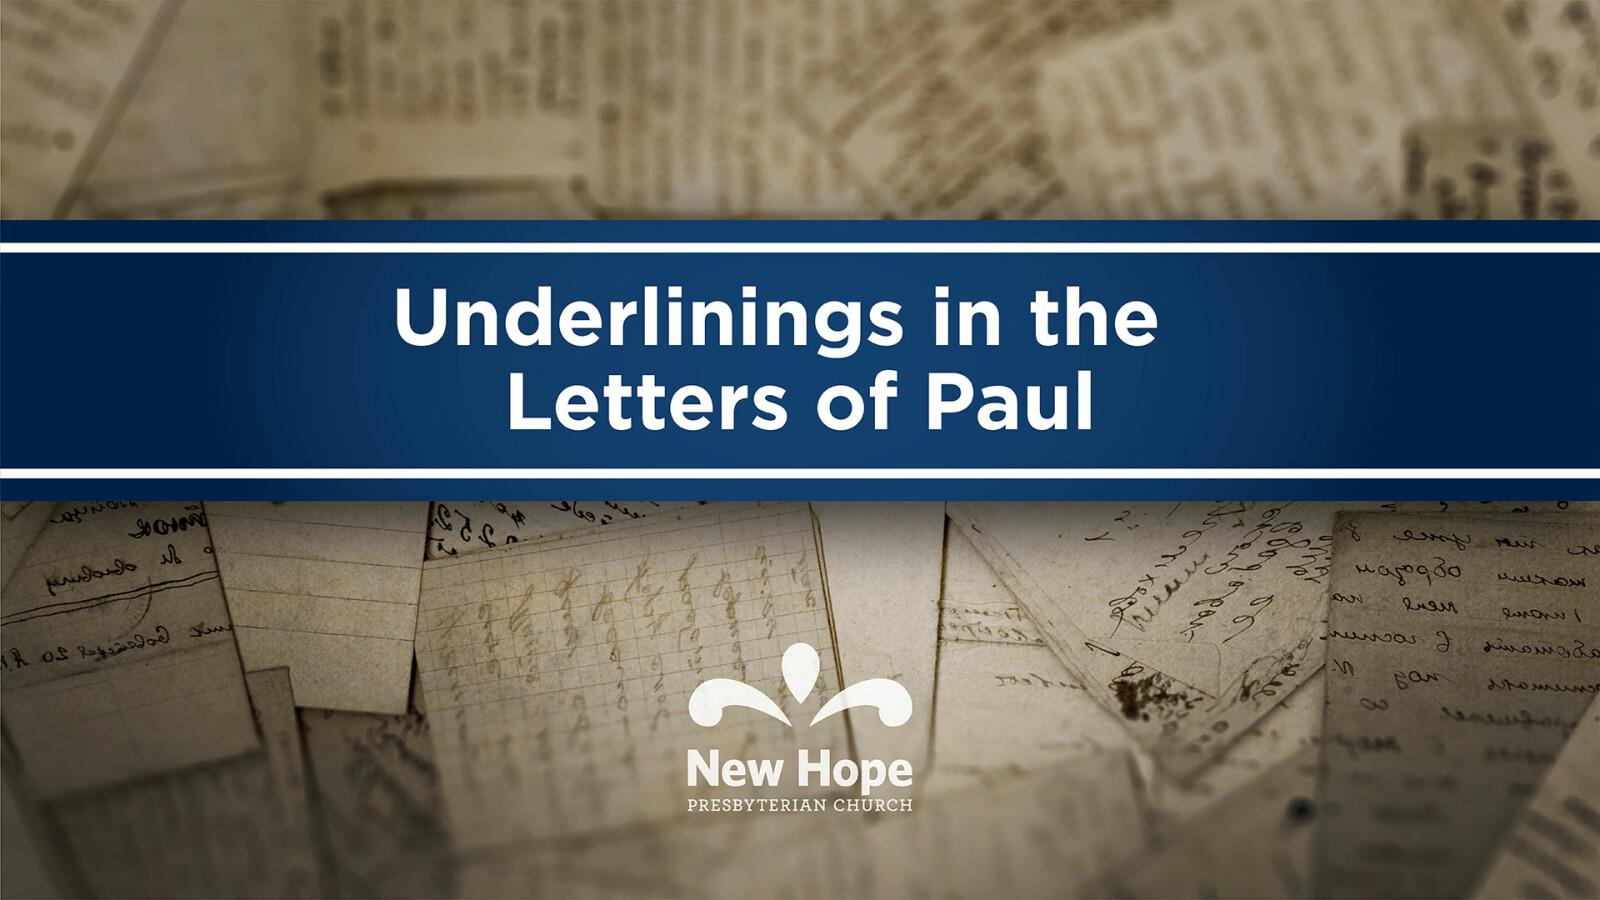 Underlinings in the Letters of Paul